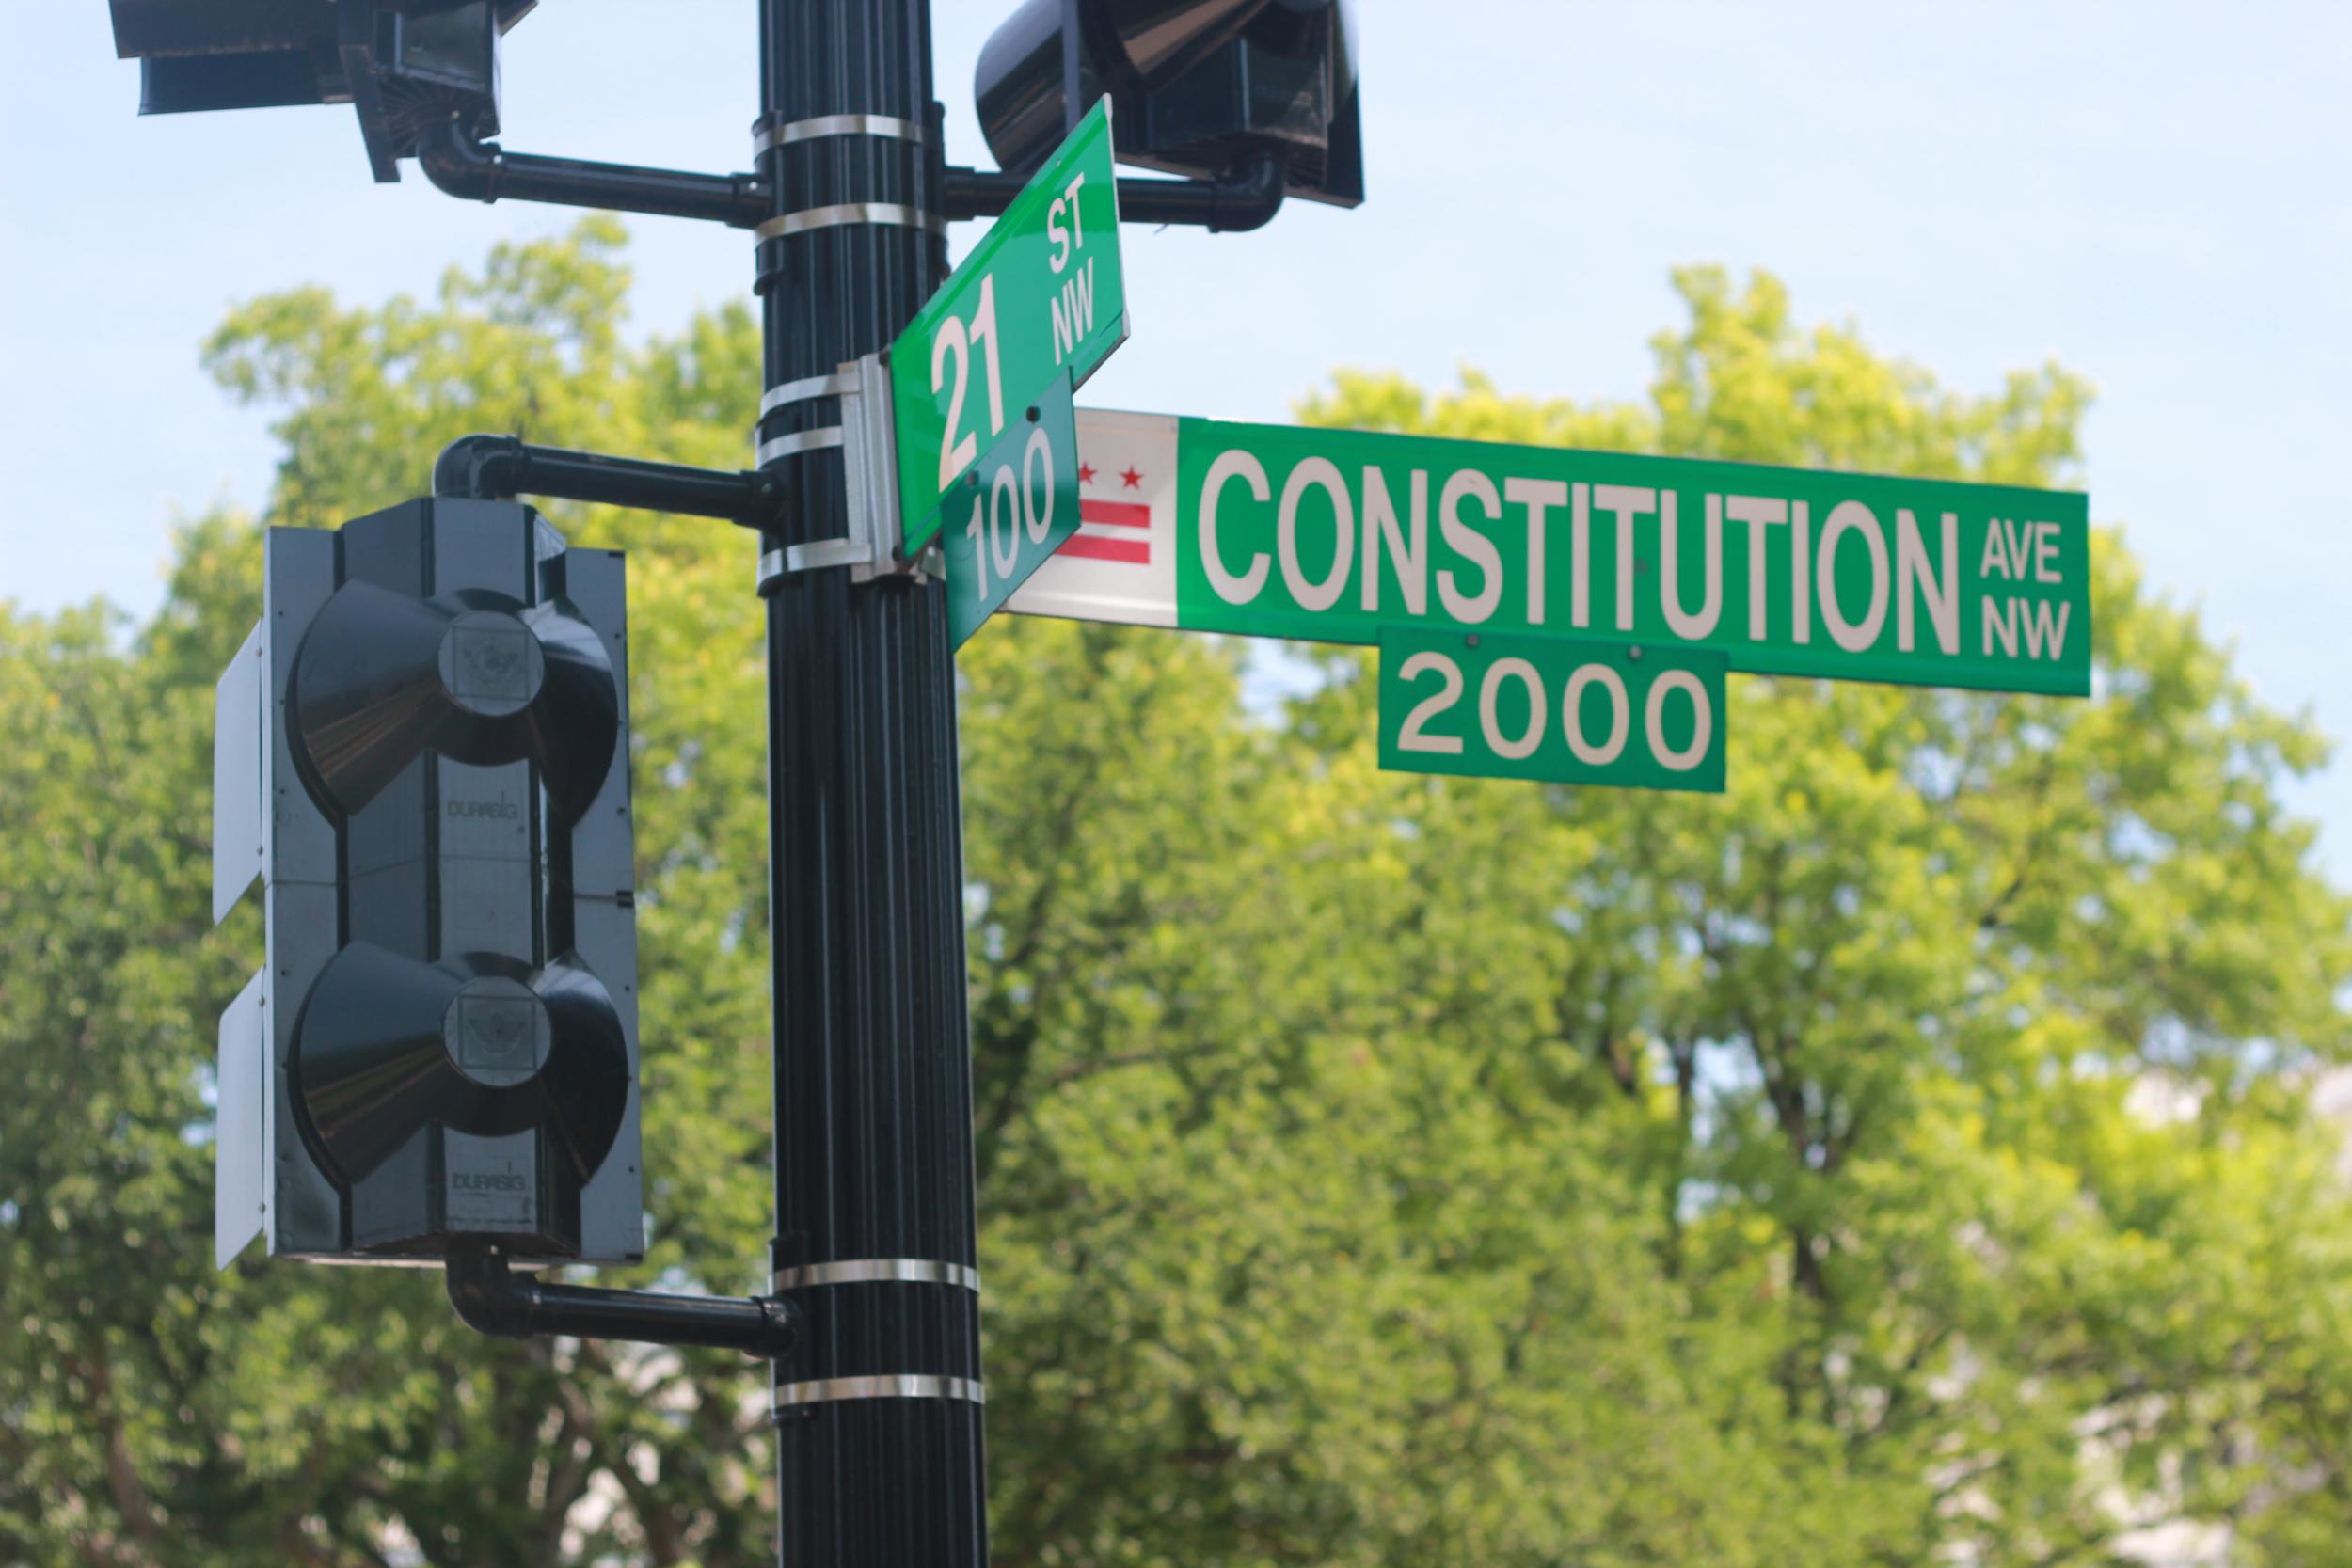 constitution-ave-washington-dc.jpg